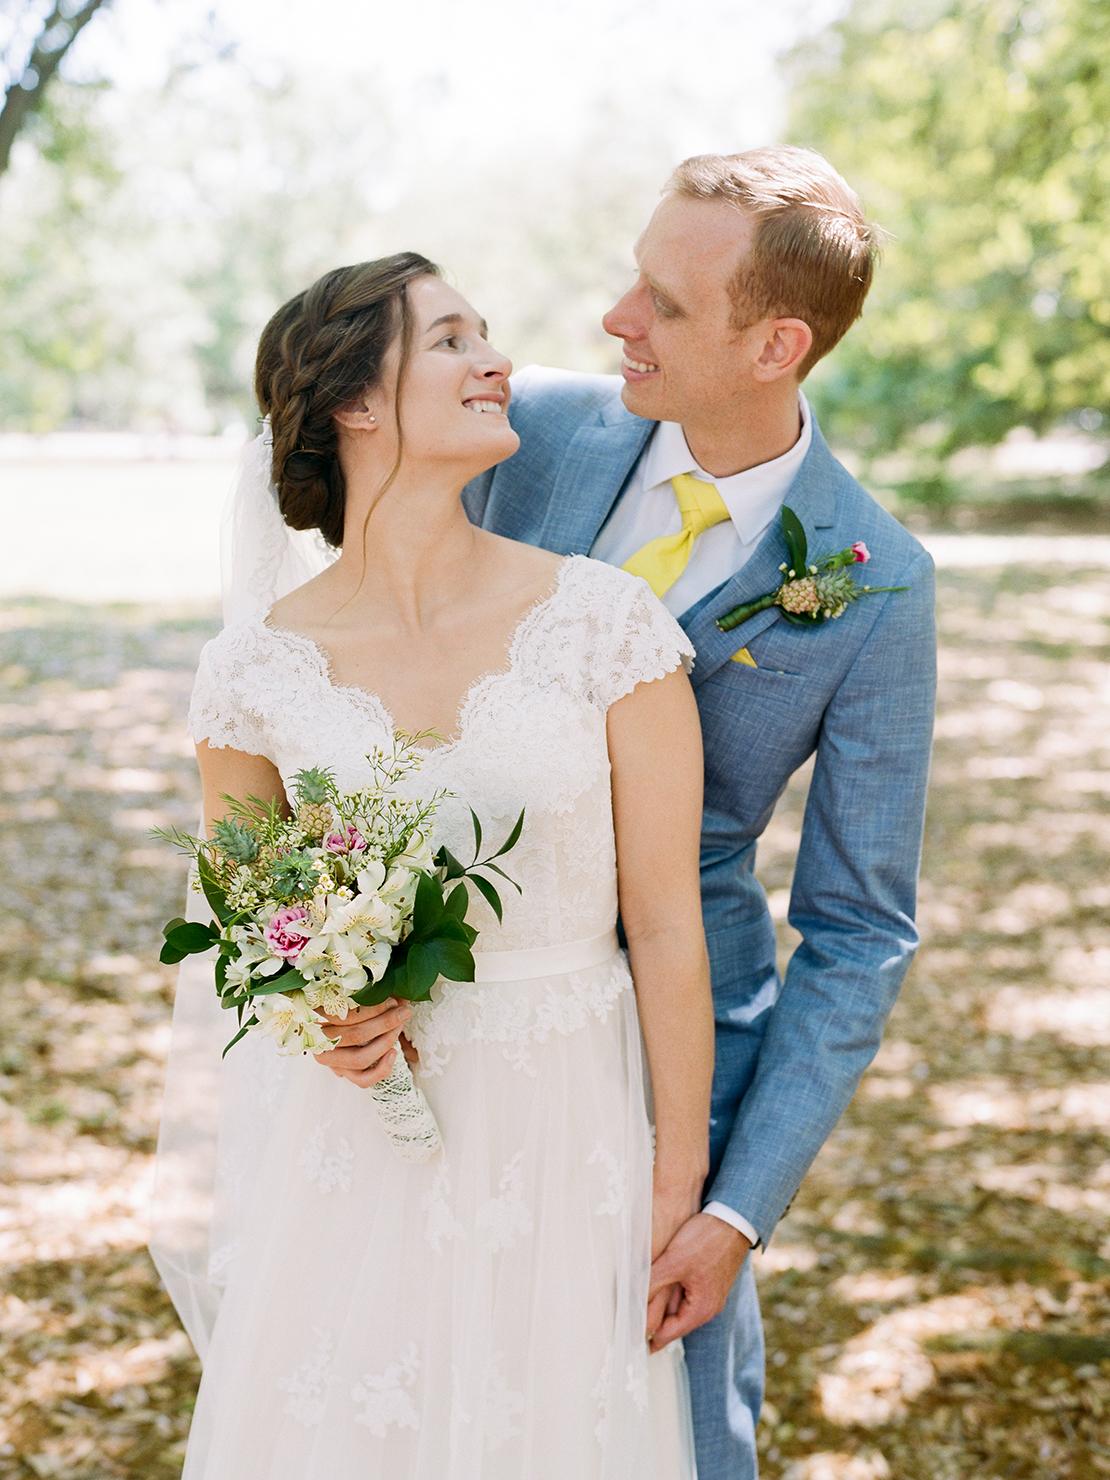 New Orleans Wedding at Audubon Park by Heidi Vail Fine Art Wedding Photographer Based in Orlando Florida